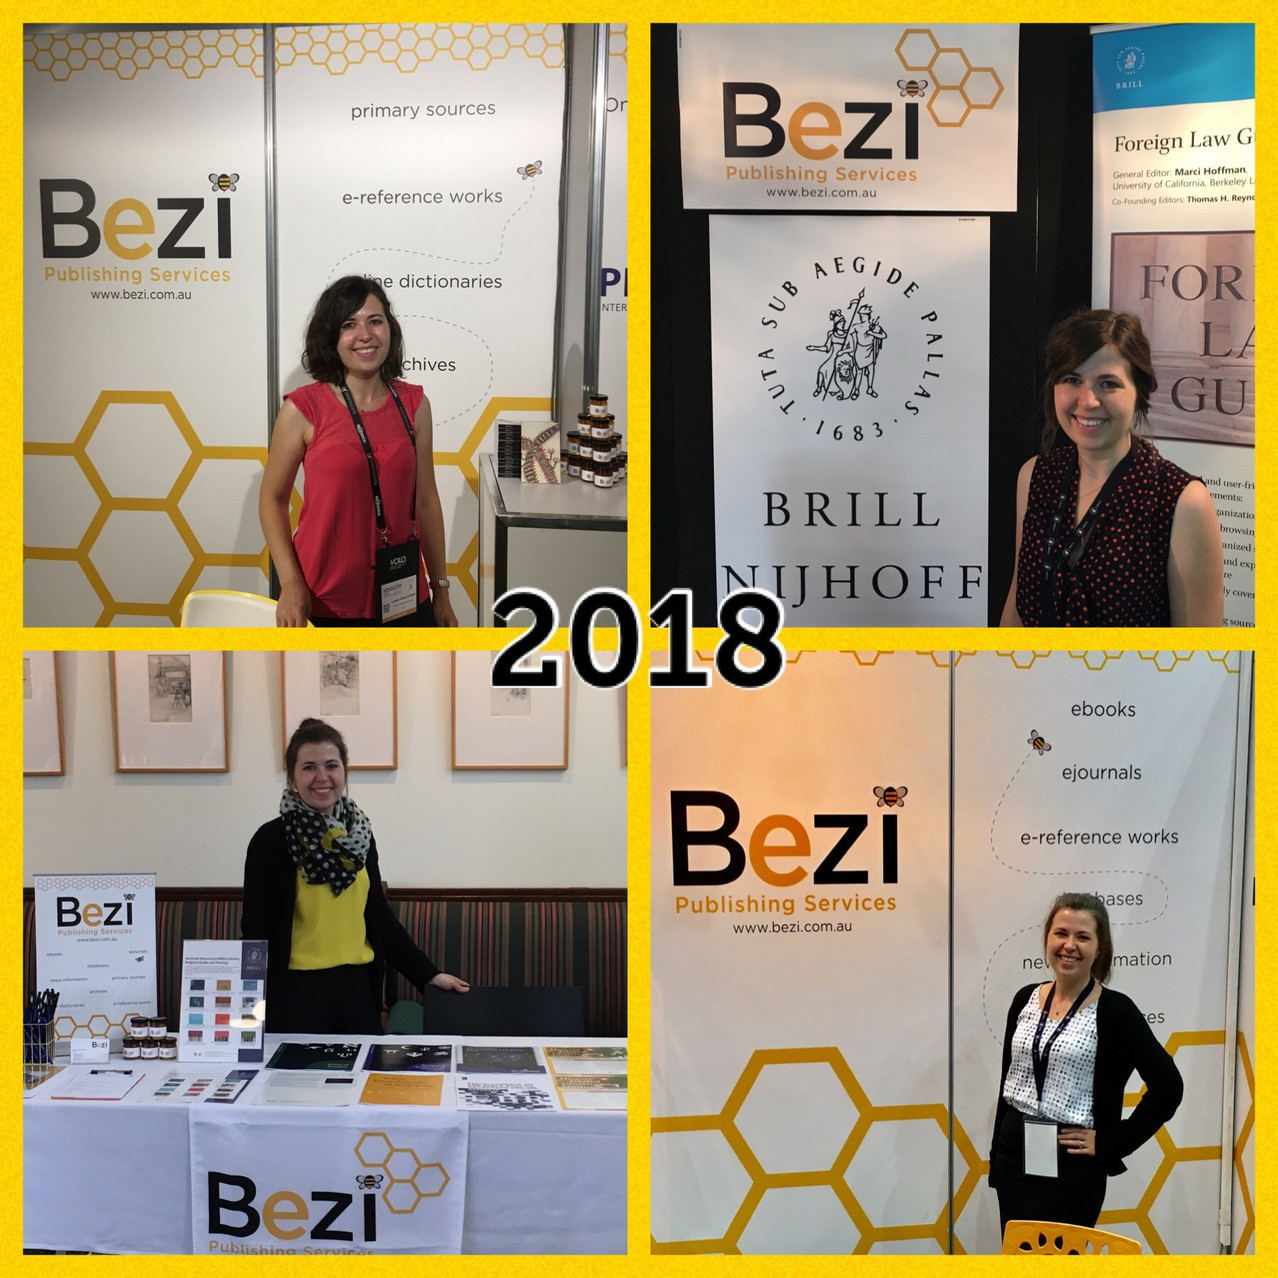 Scenes from VALA 2018, ALLA 2018, ANZTLA 2018 + APLIC 2018